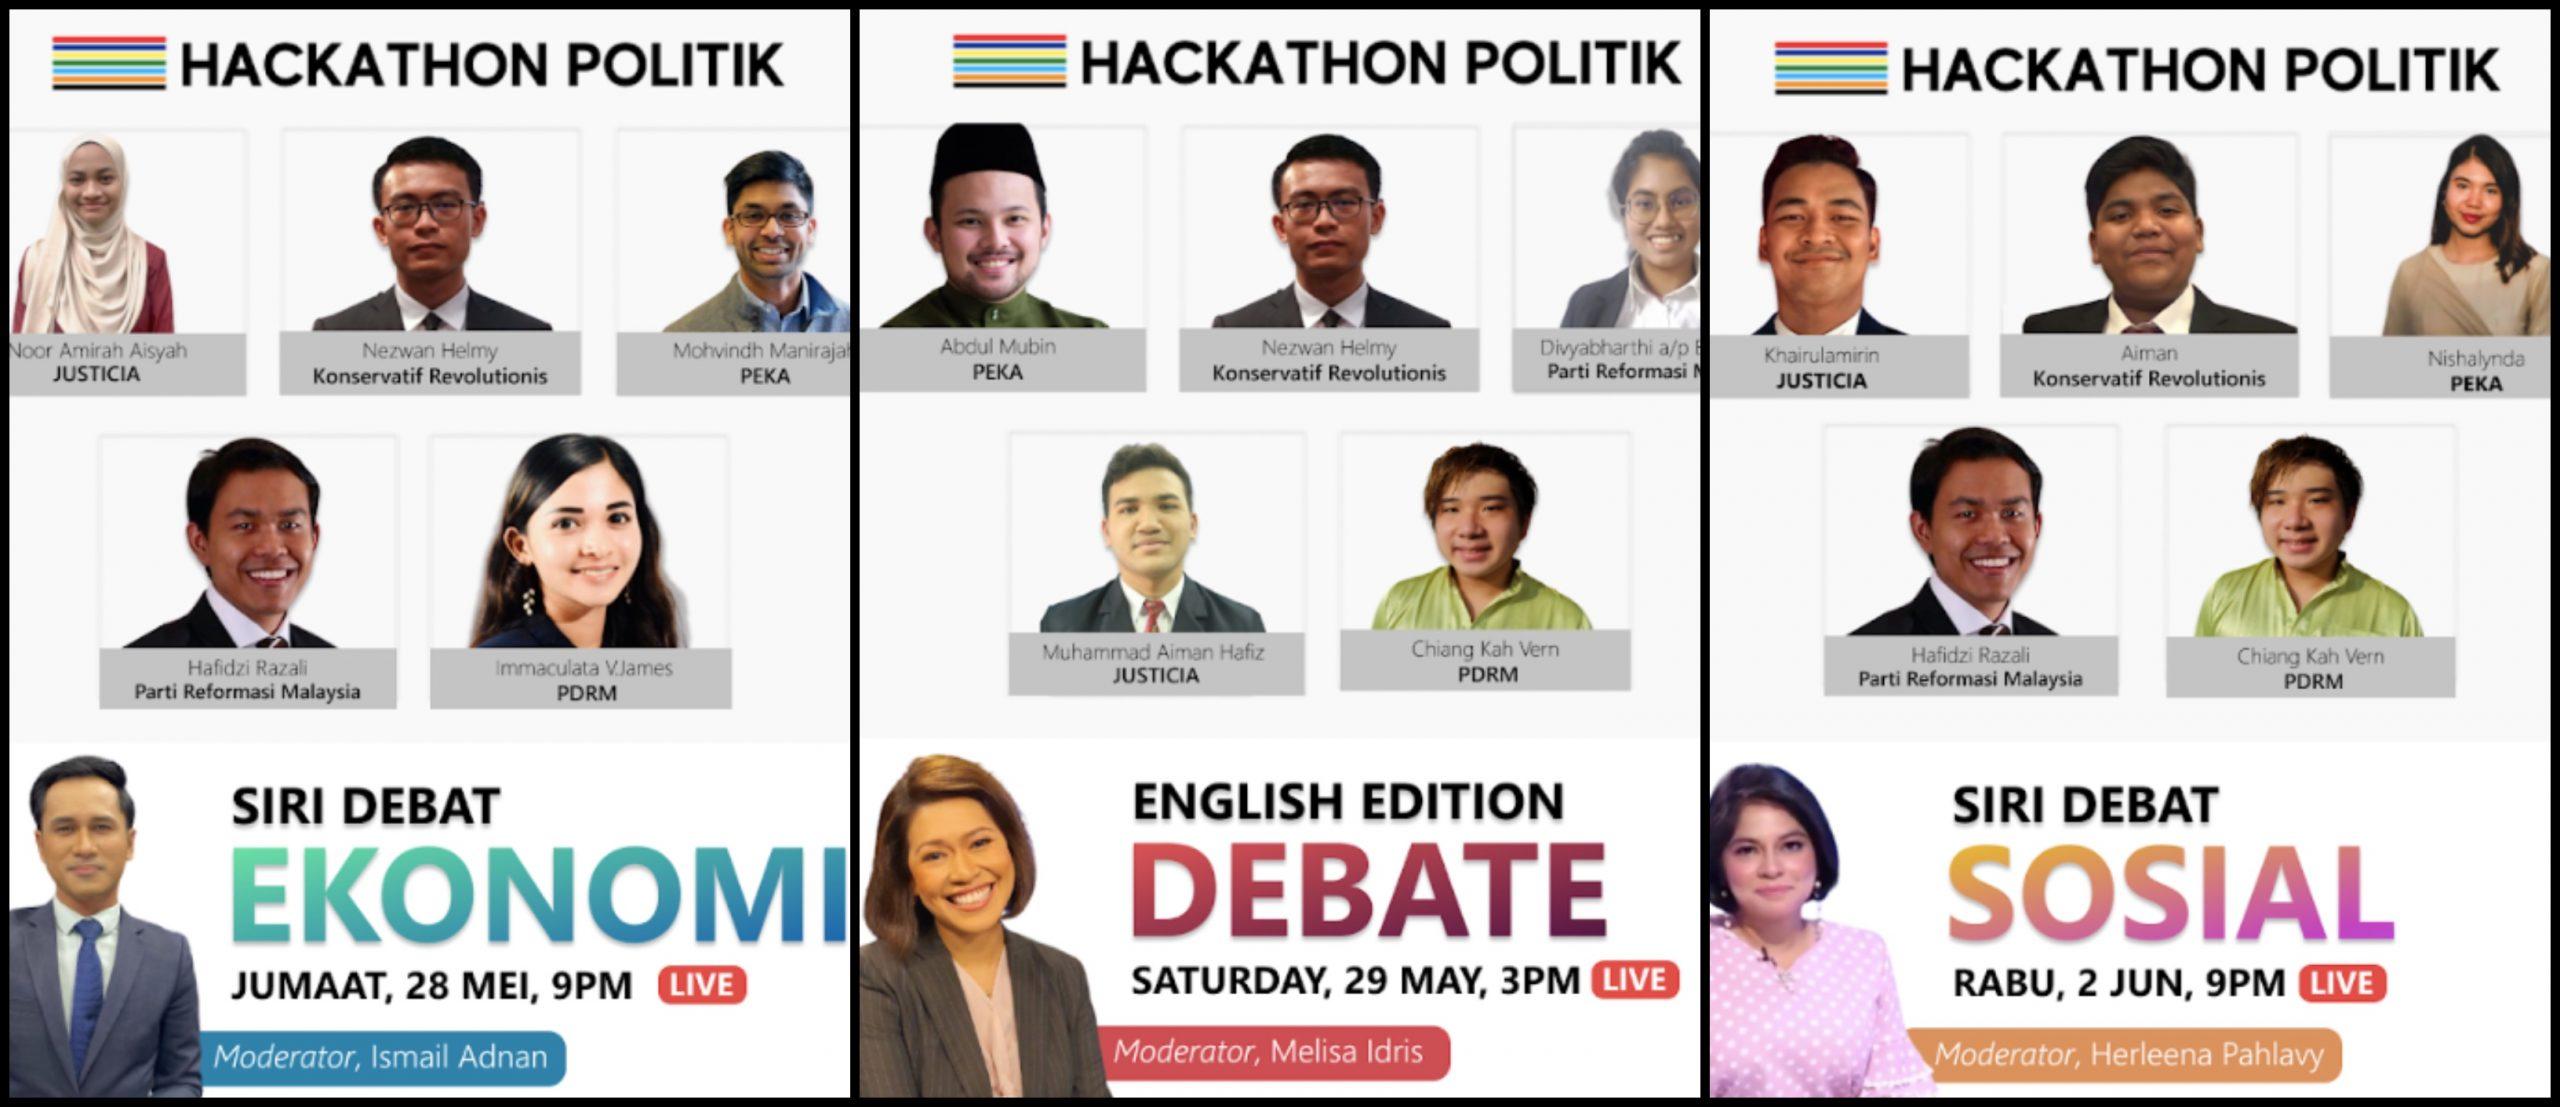 5 Parti Bakal Bertanding Di Hackathon Politik, Kini Giliran Anda Pula Untuk Menentukan. Jom Kita 'Mengundi'! 9